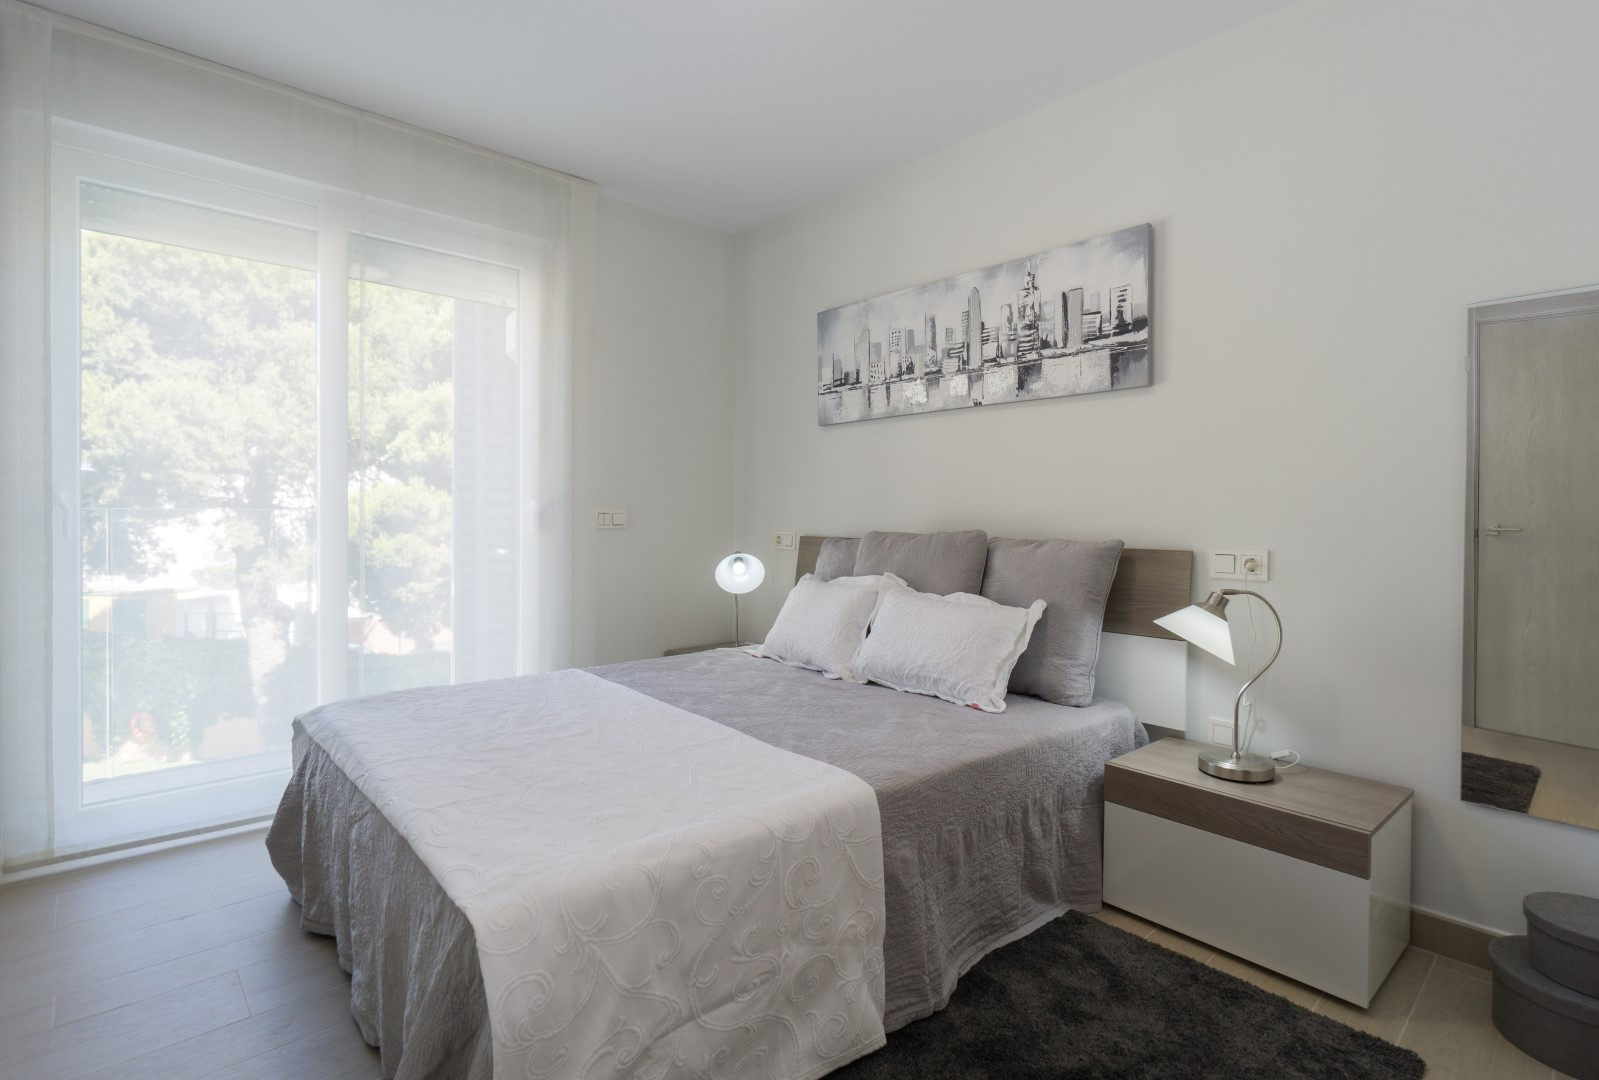 Apartment in Benalmadena MA3142741 10